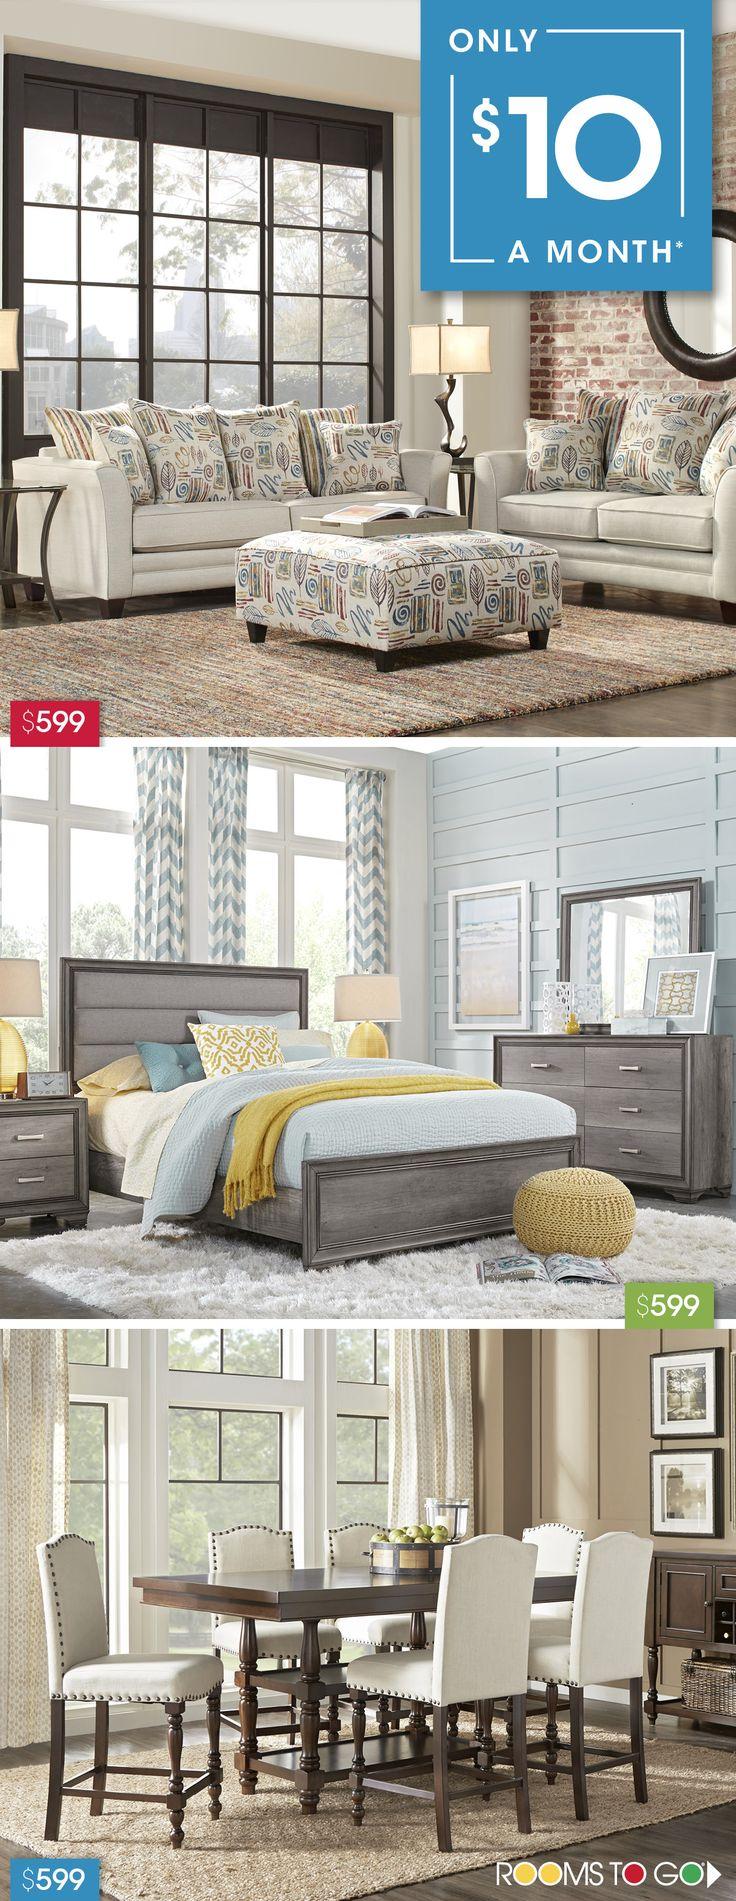 165 best lovely living spaces images on pinterest for Living room furniture 0 finance